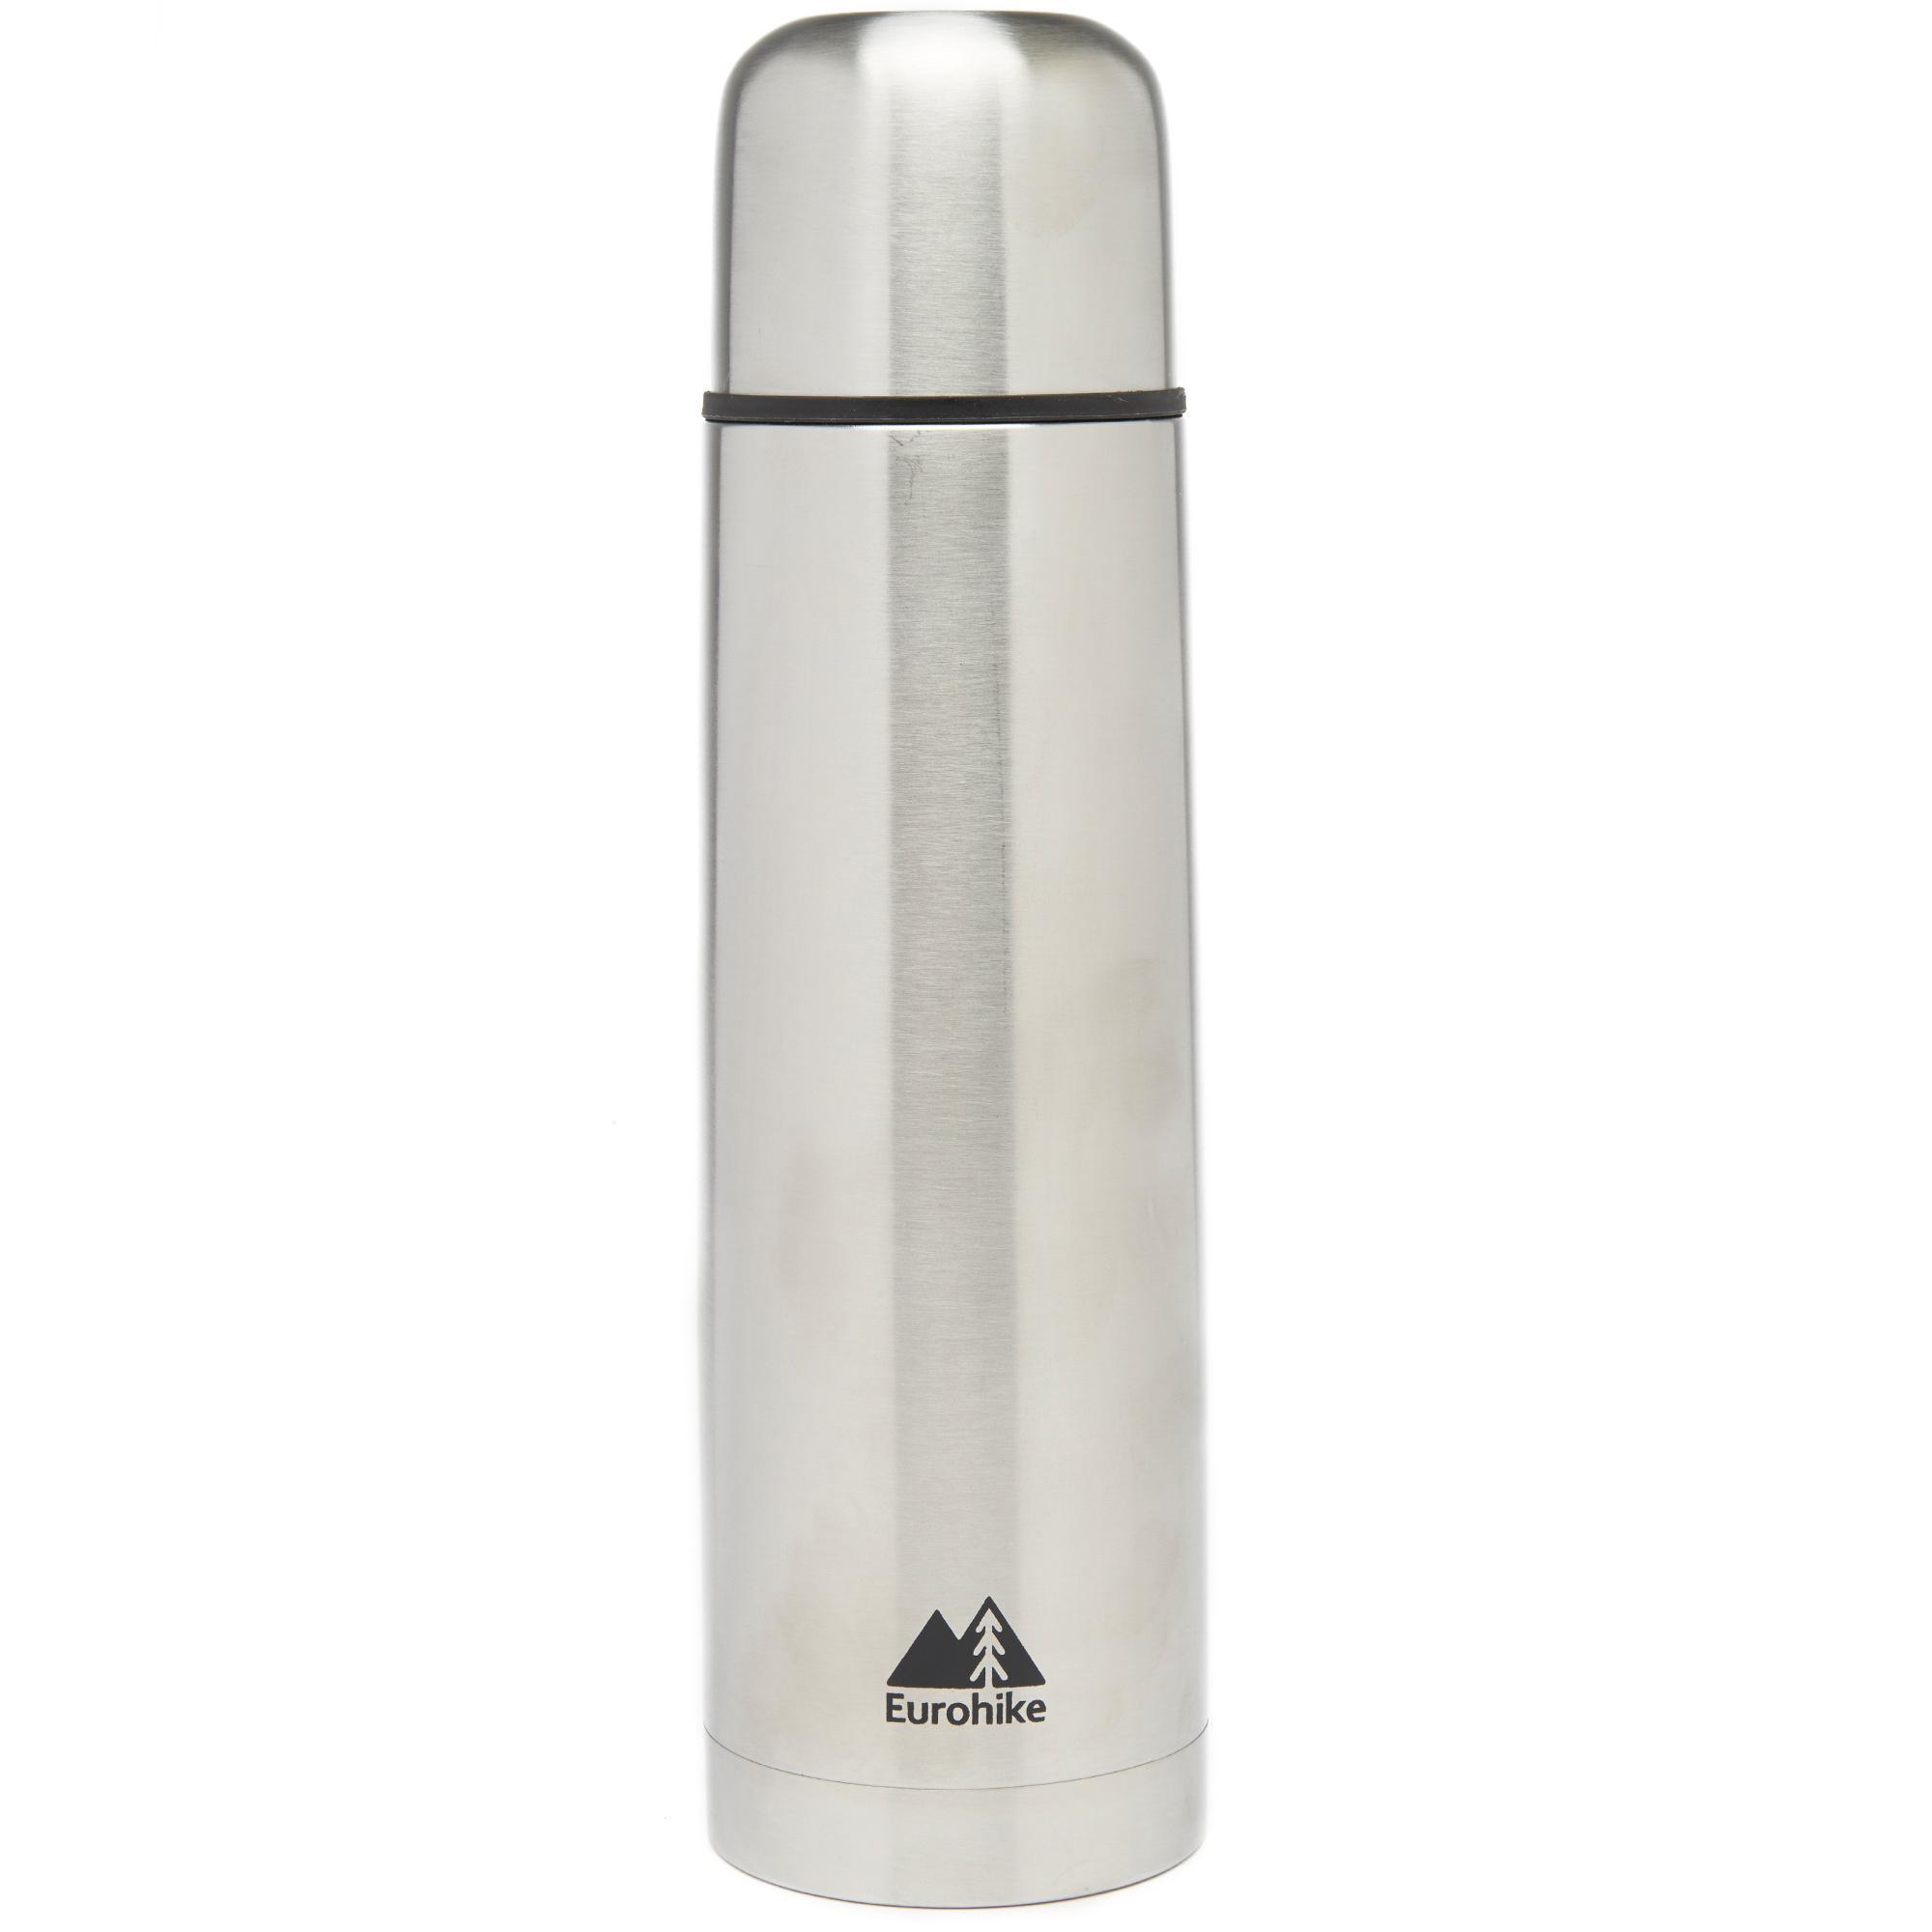 New Eurohike Stainless Steel Flask 1L Hydration Flasks Mugs